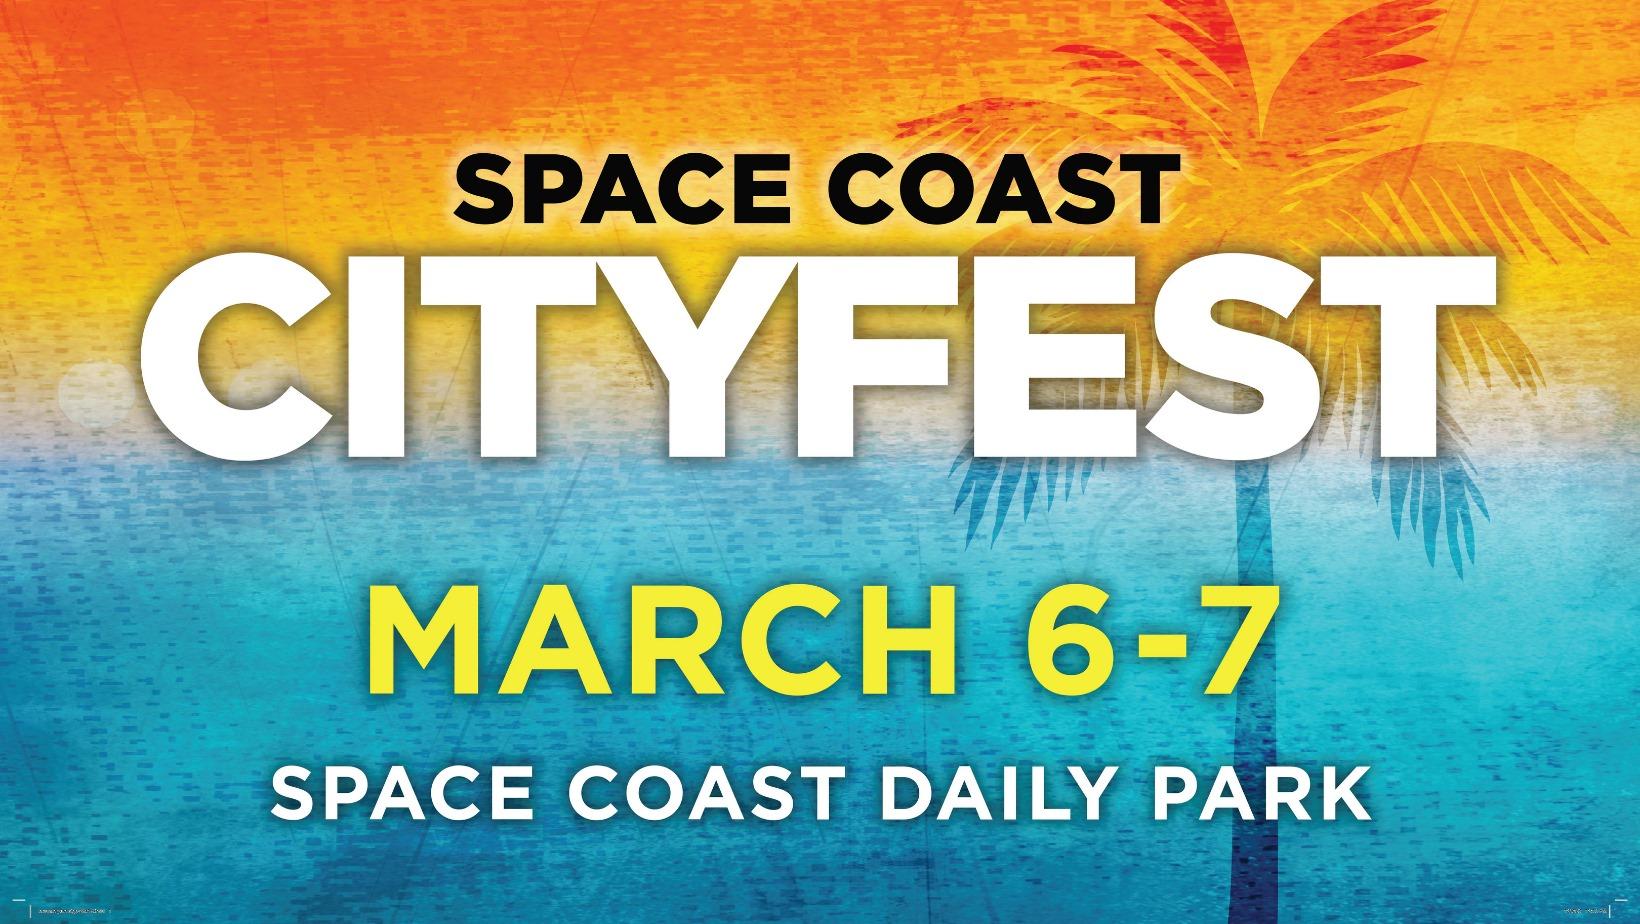 SpaceCoast CItyfest